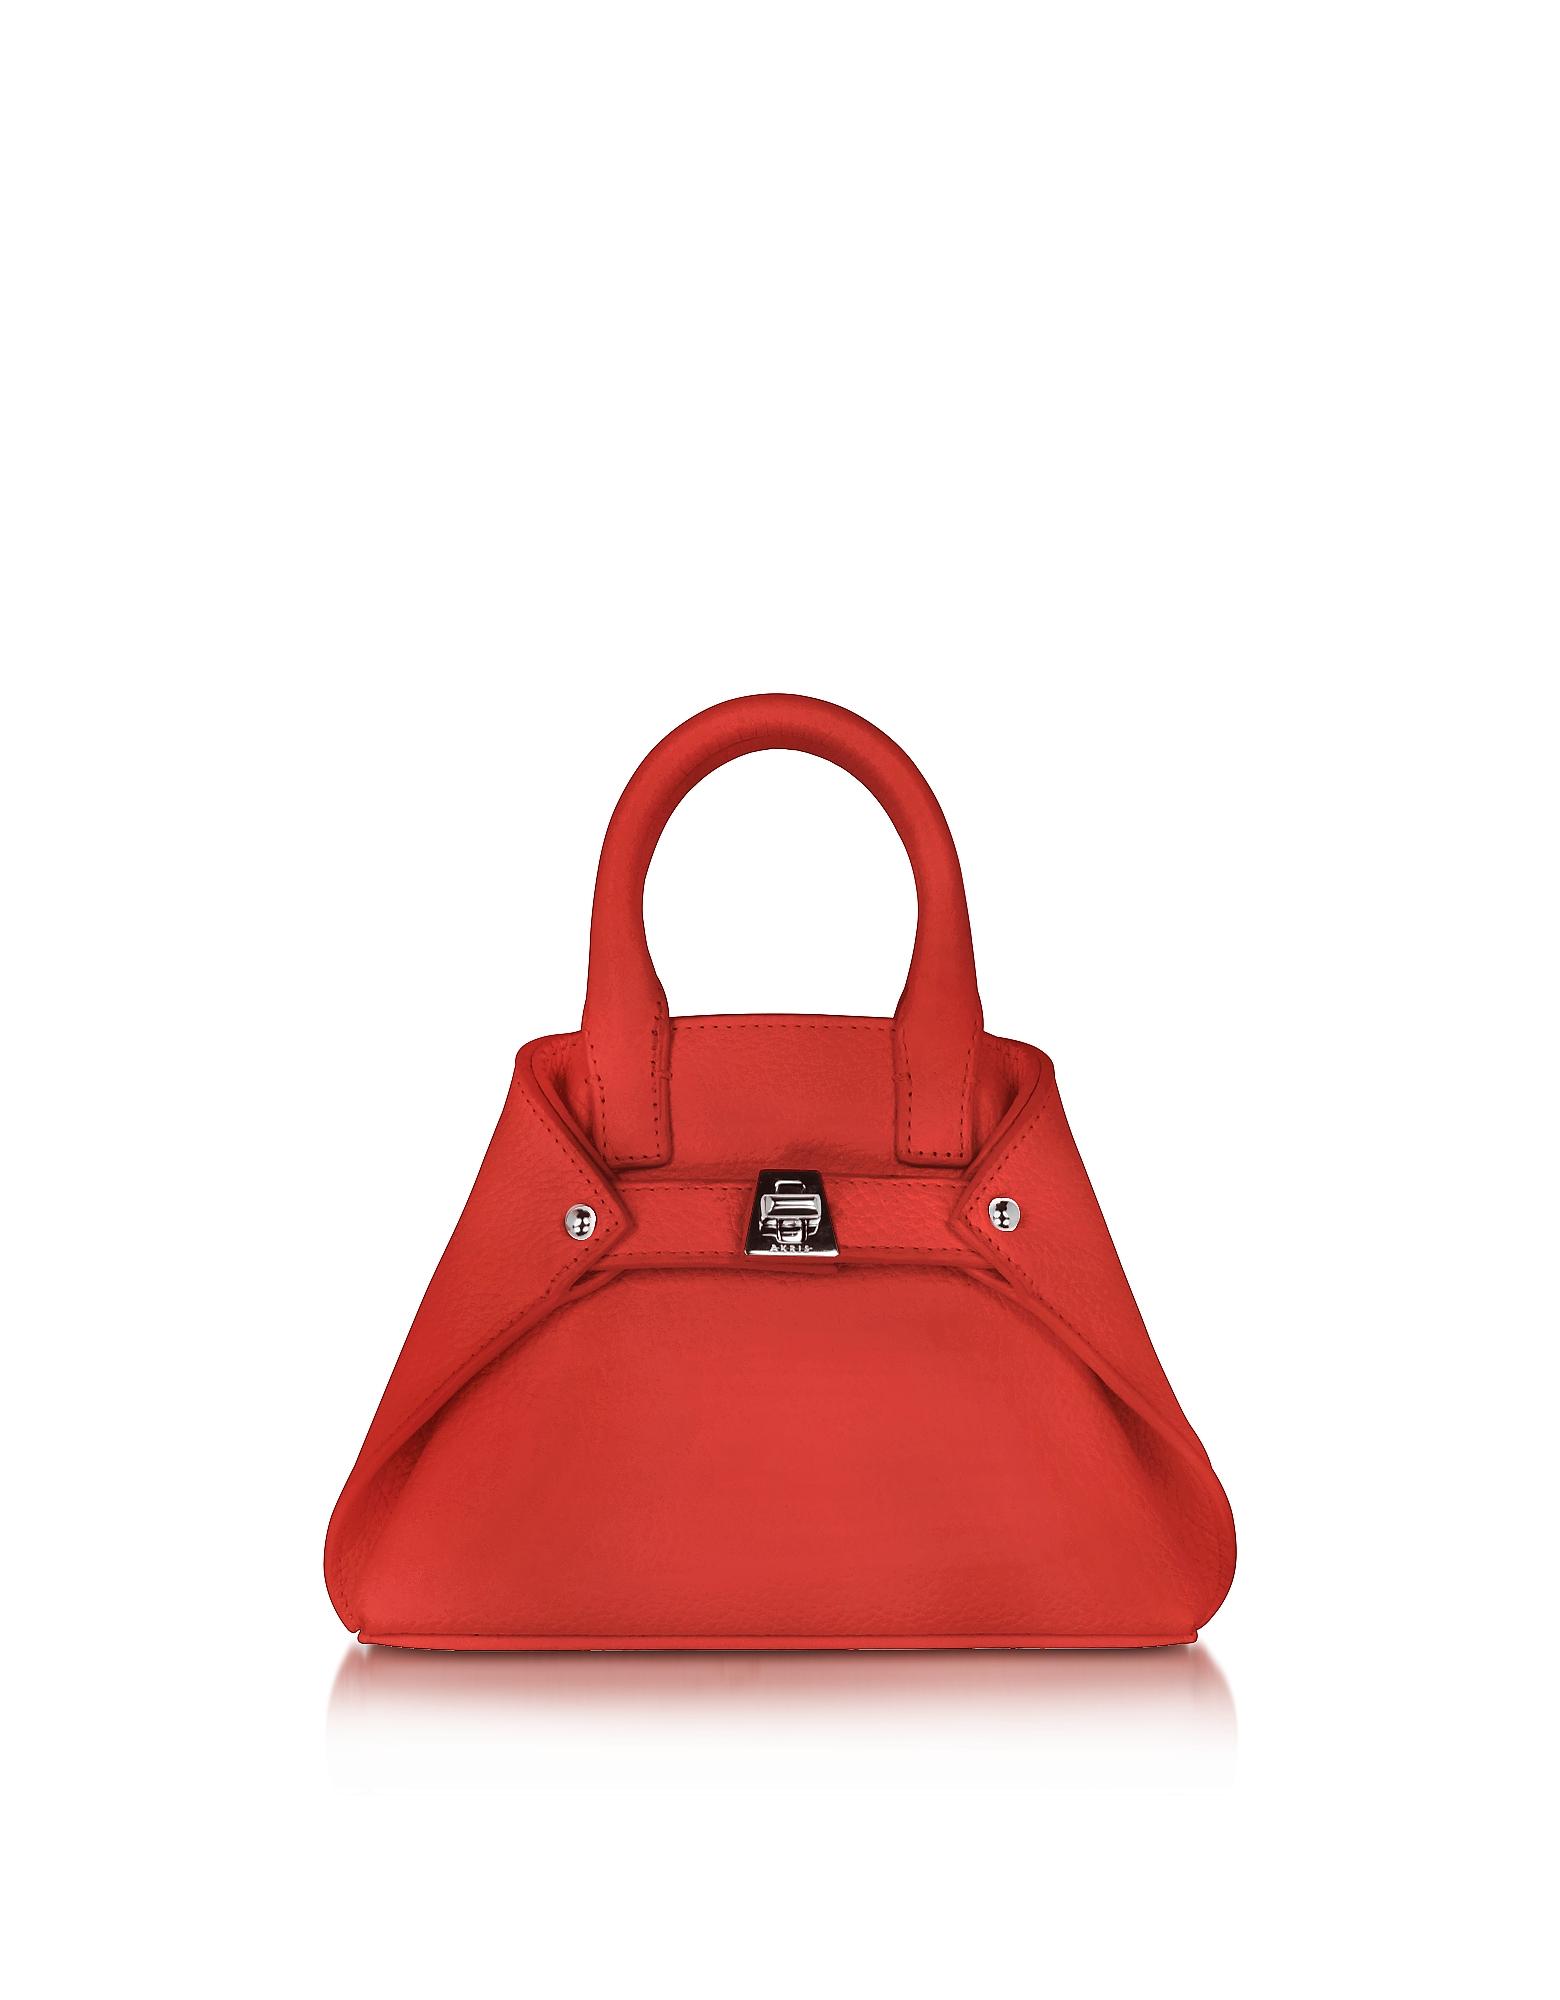 Akris Handbags, Scarlet Leather Micro Ai Crossbody Bag